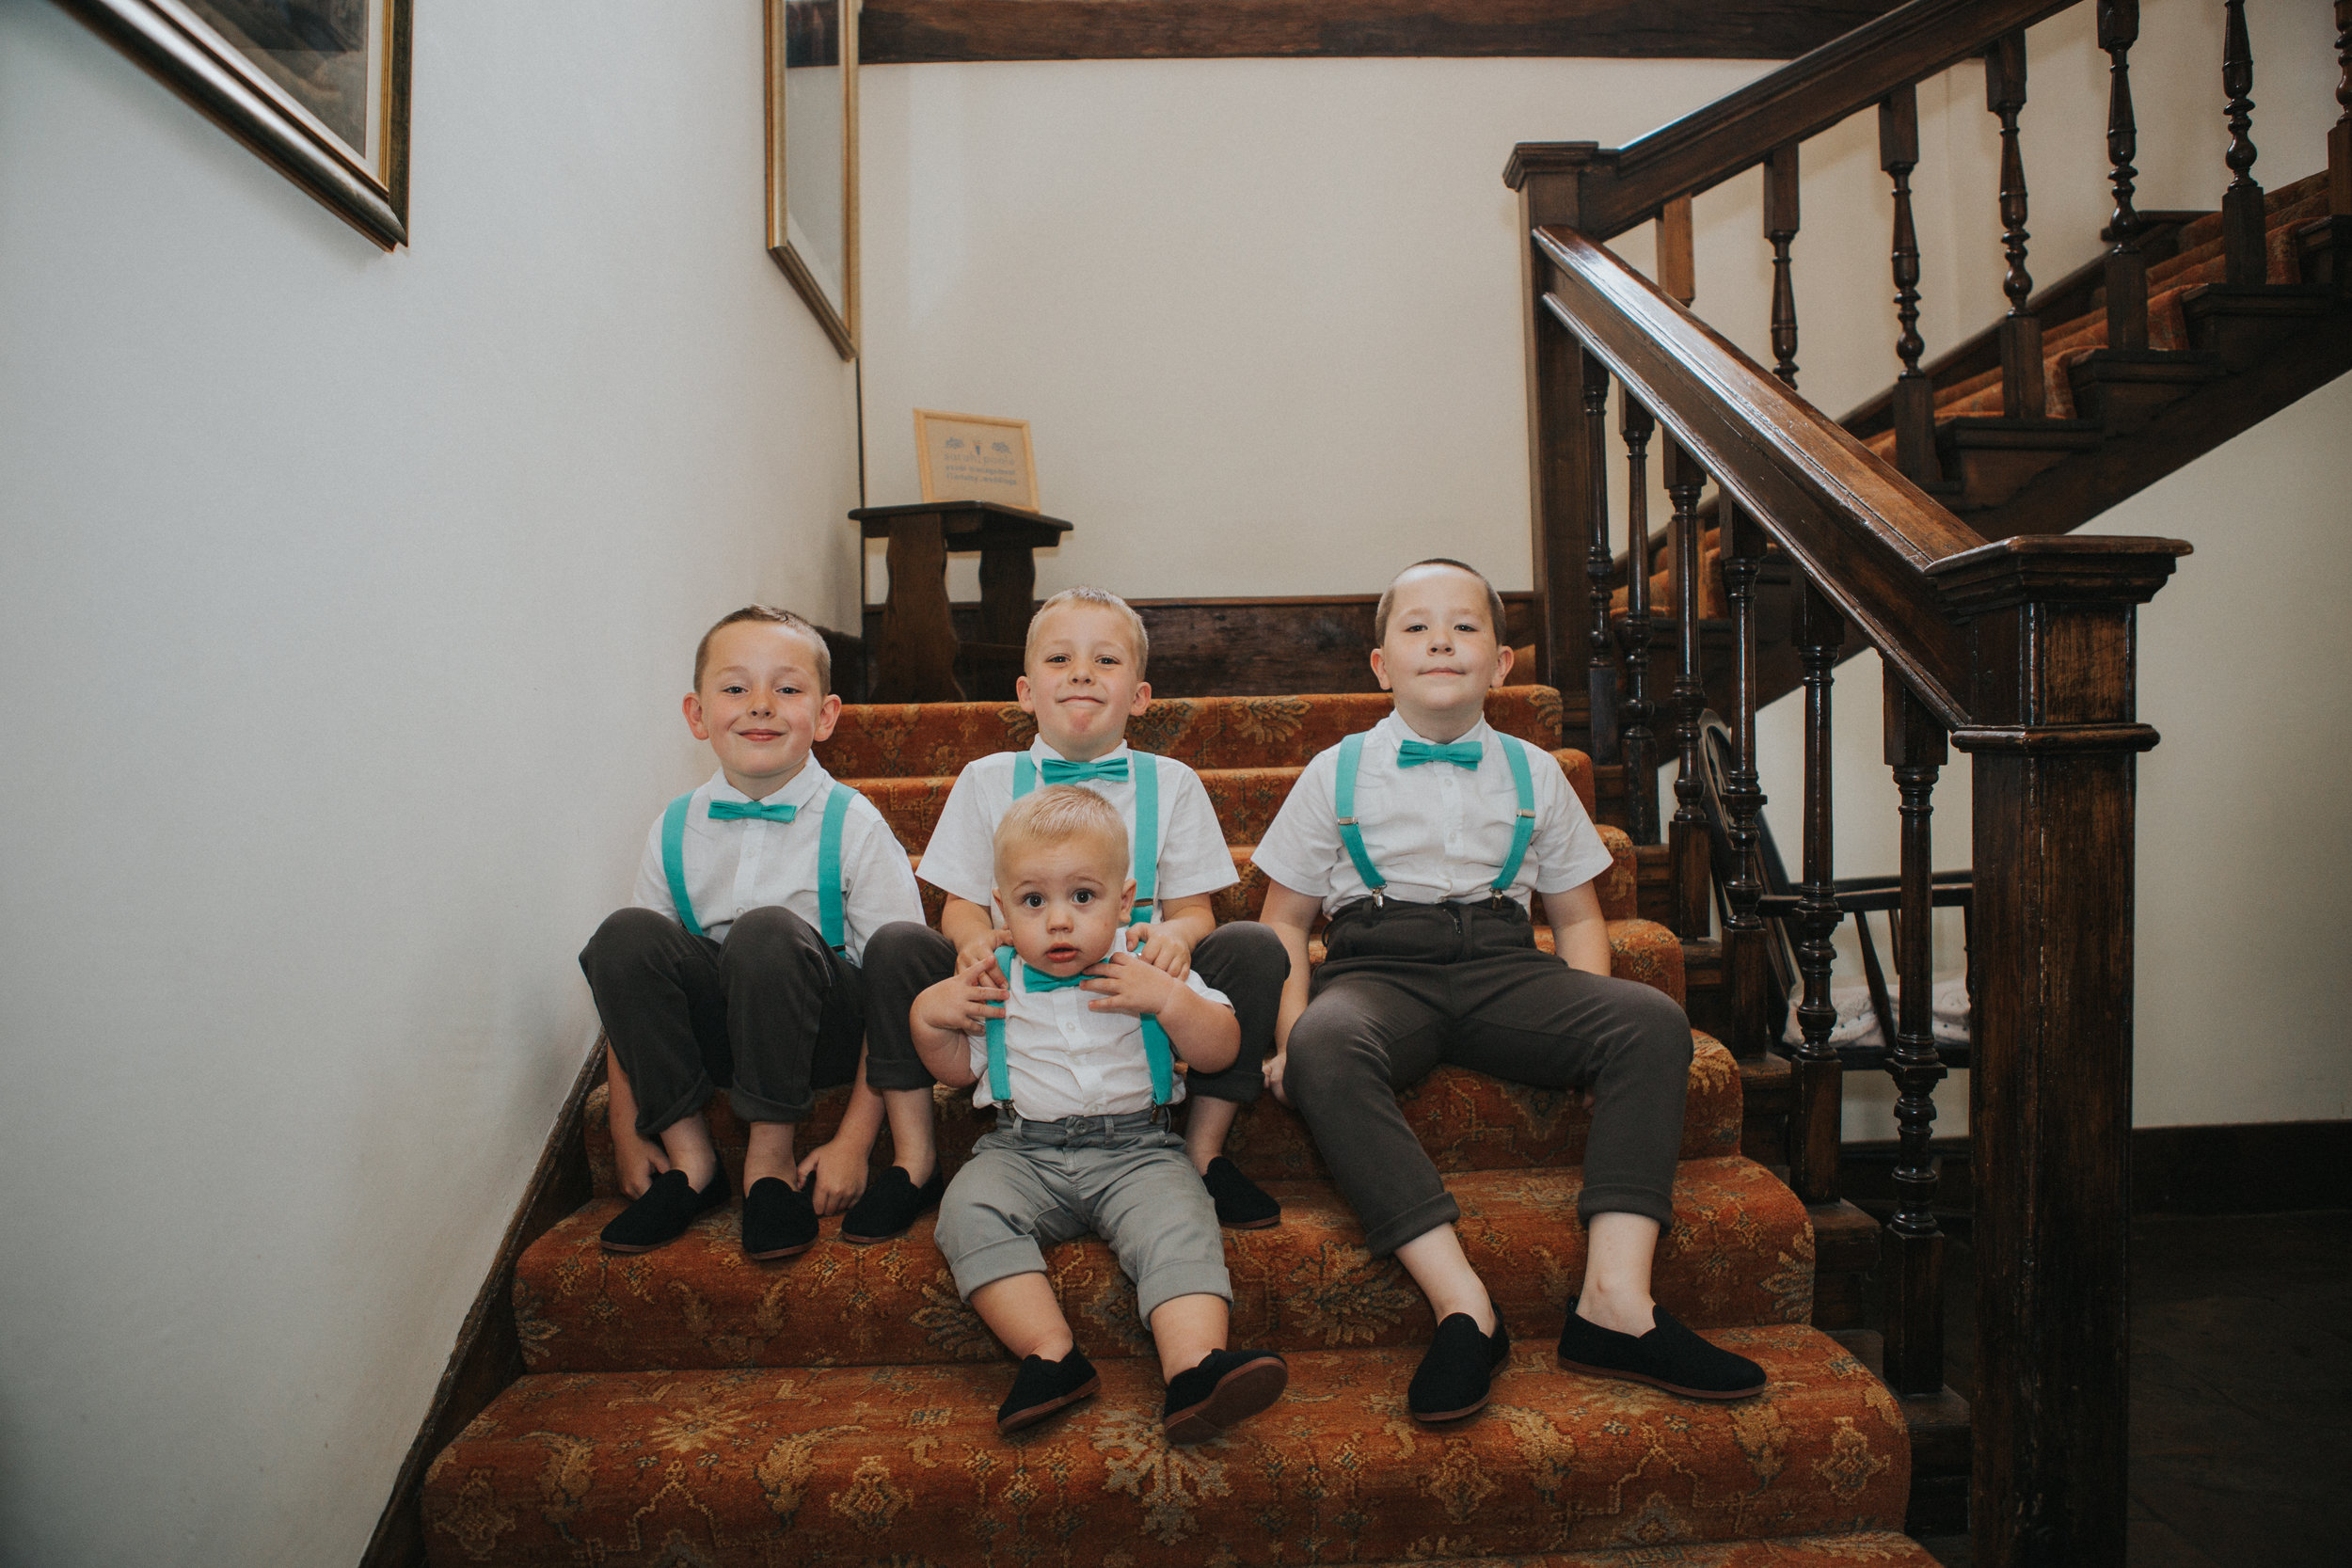 westenhangar-castle-kent-london-wedding-photography-groom-prep-27